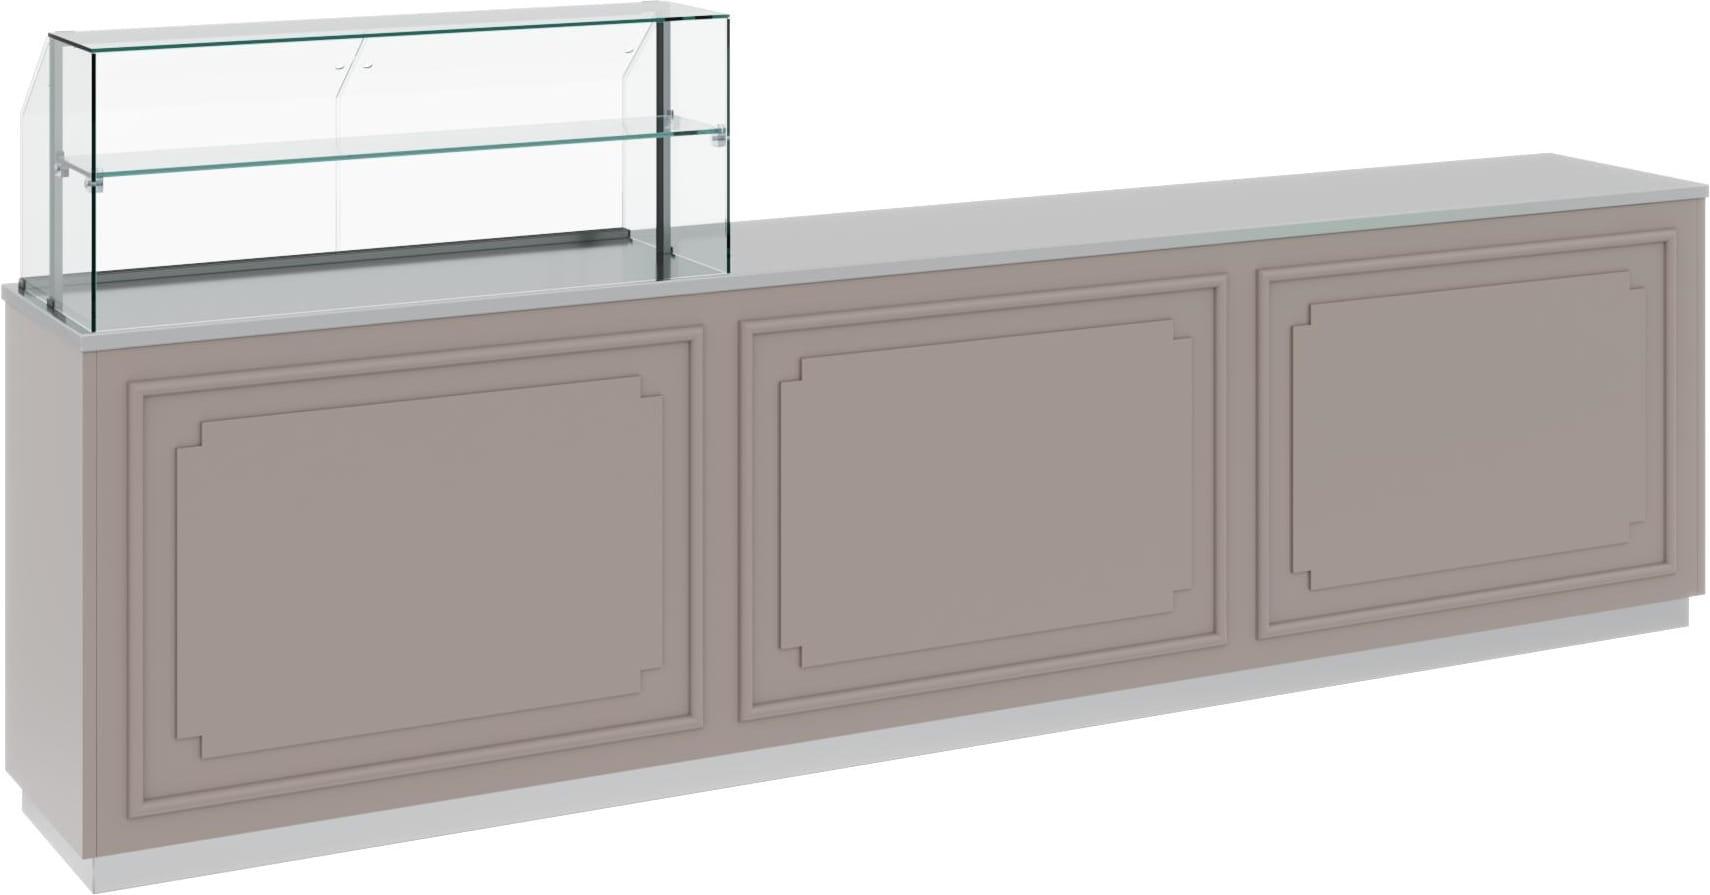 Нейтральная витрина CARBOMA OMI AC40N 1.0-11 - 1